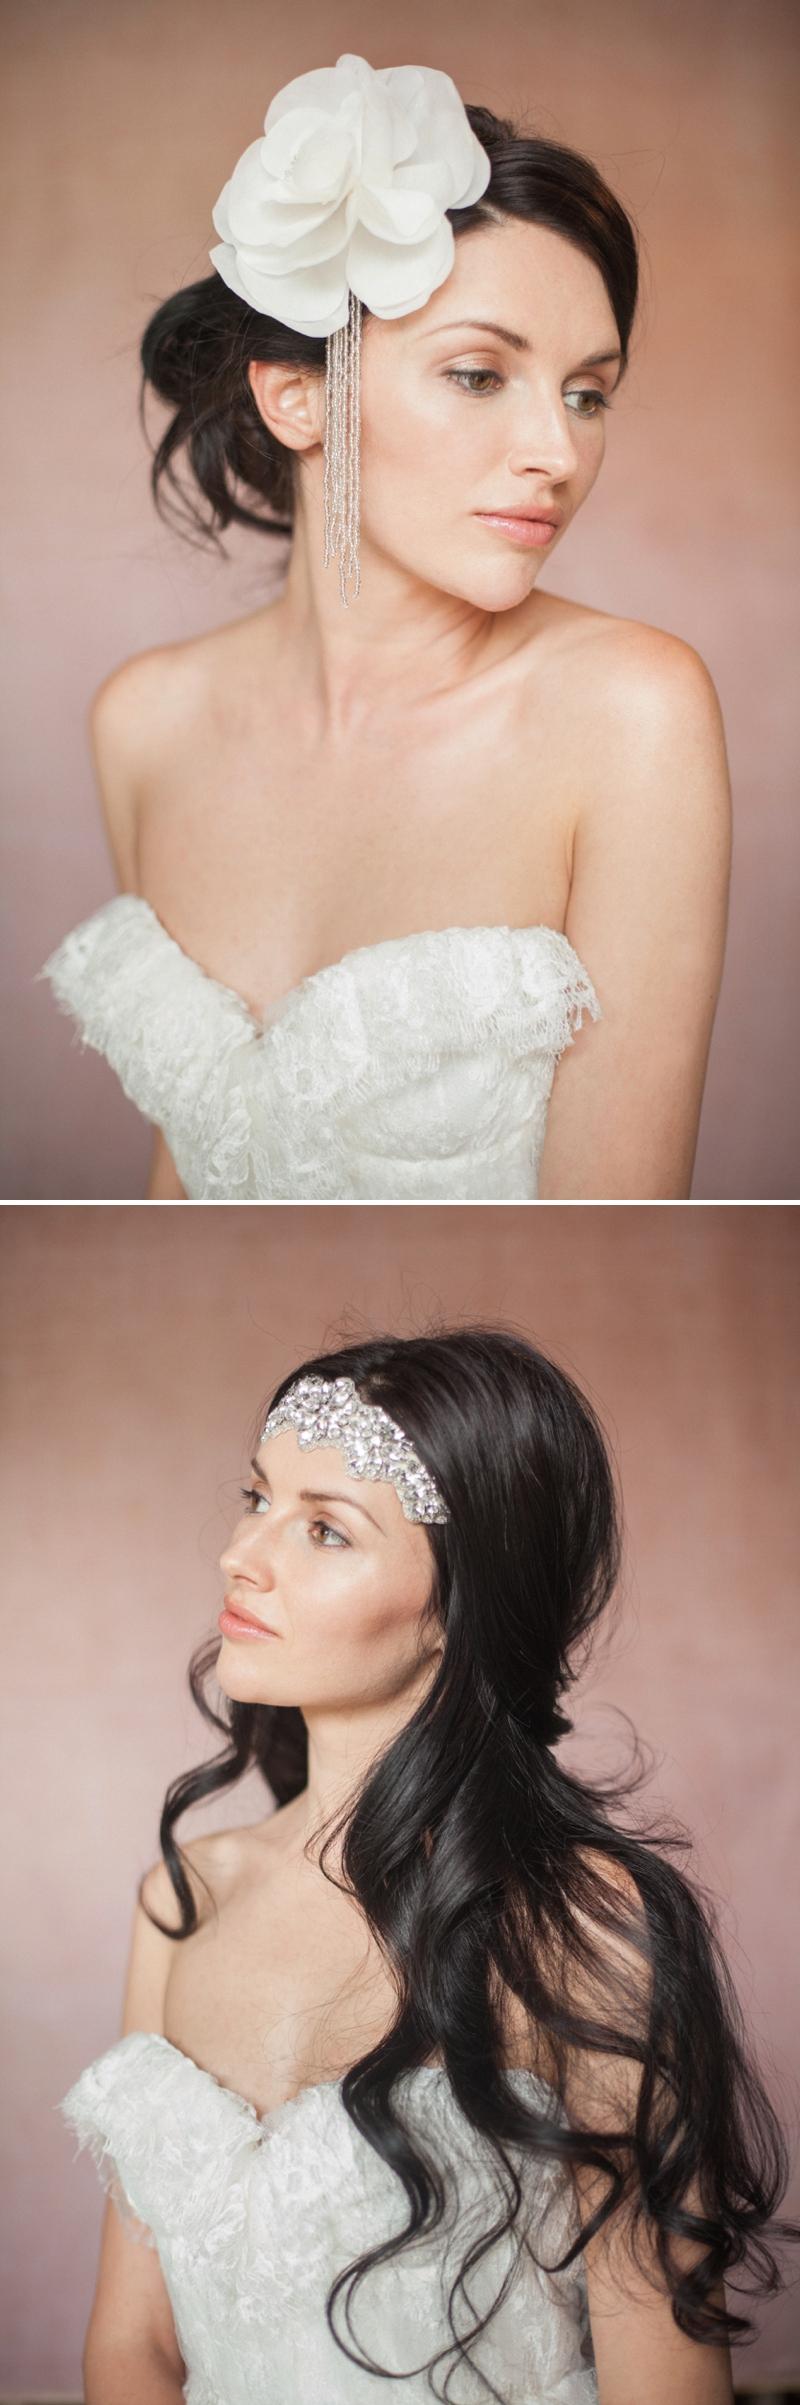 Britten 2014 Liberte Collection vintage inspired bridal wedding accessories headpieces_0153